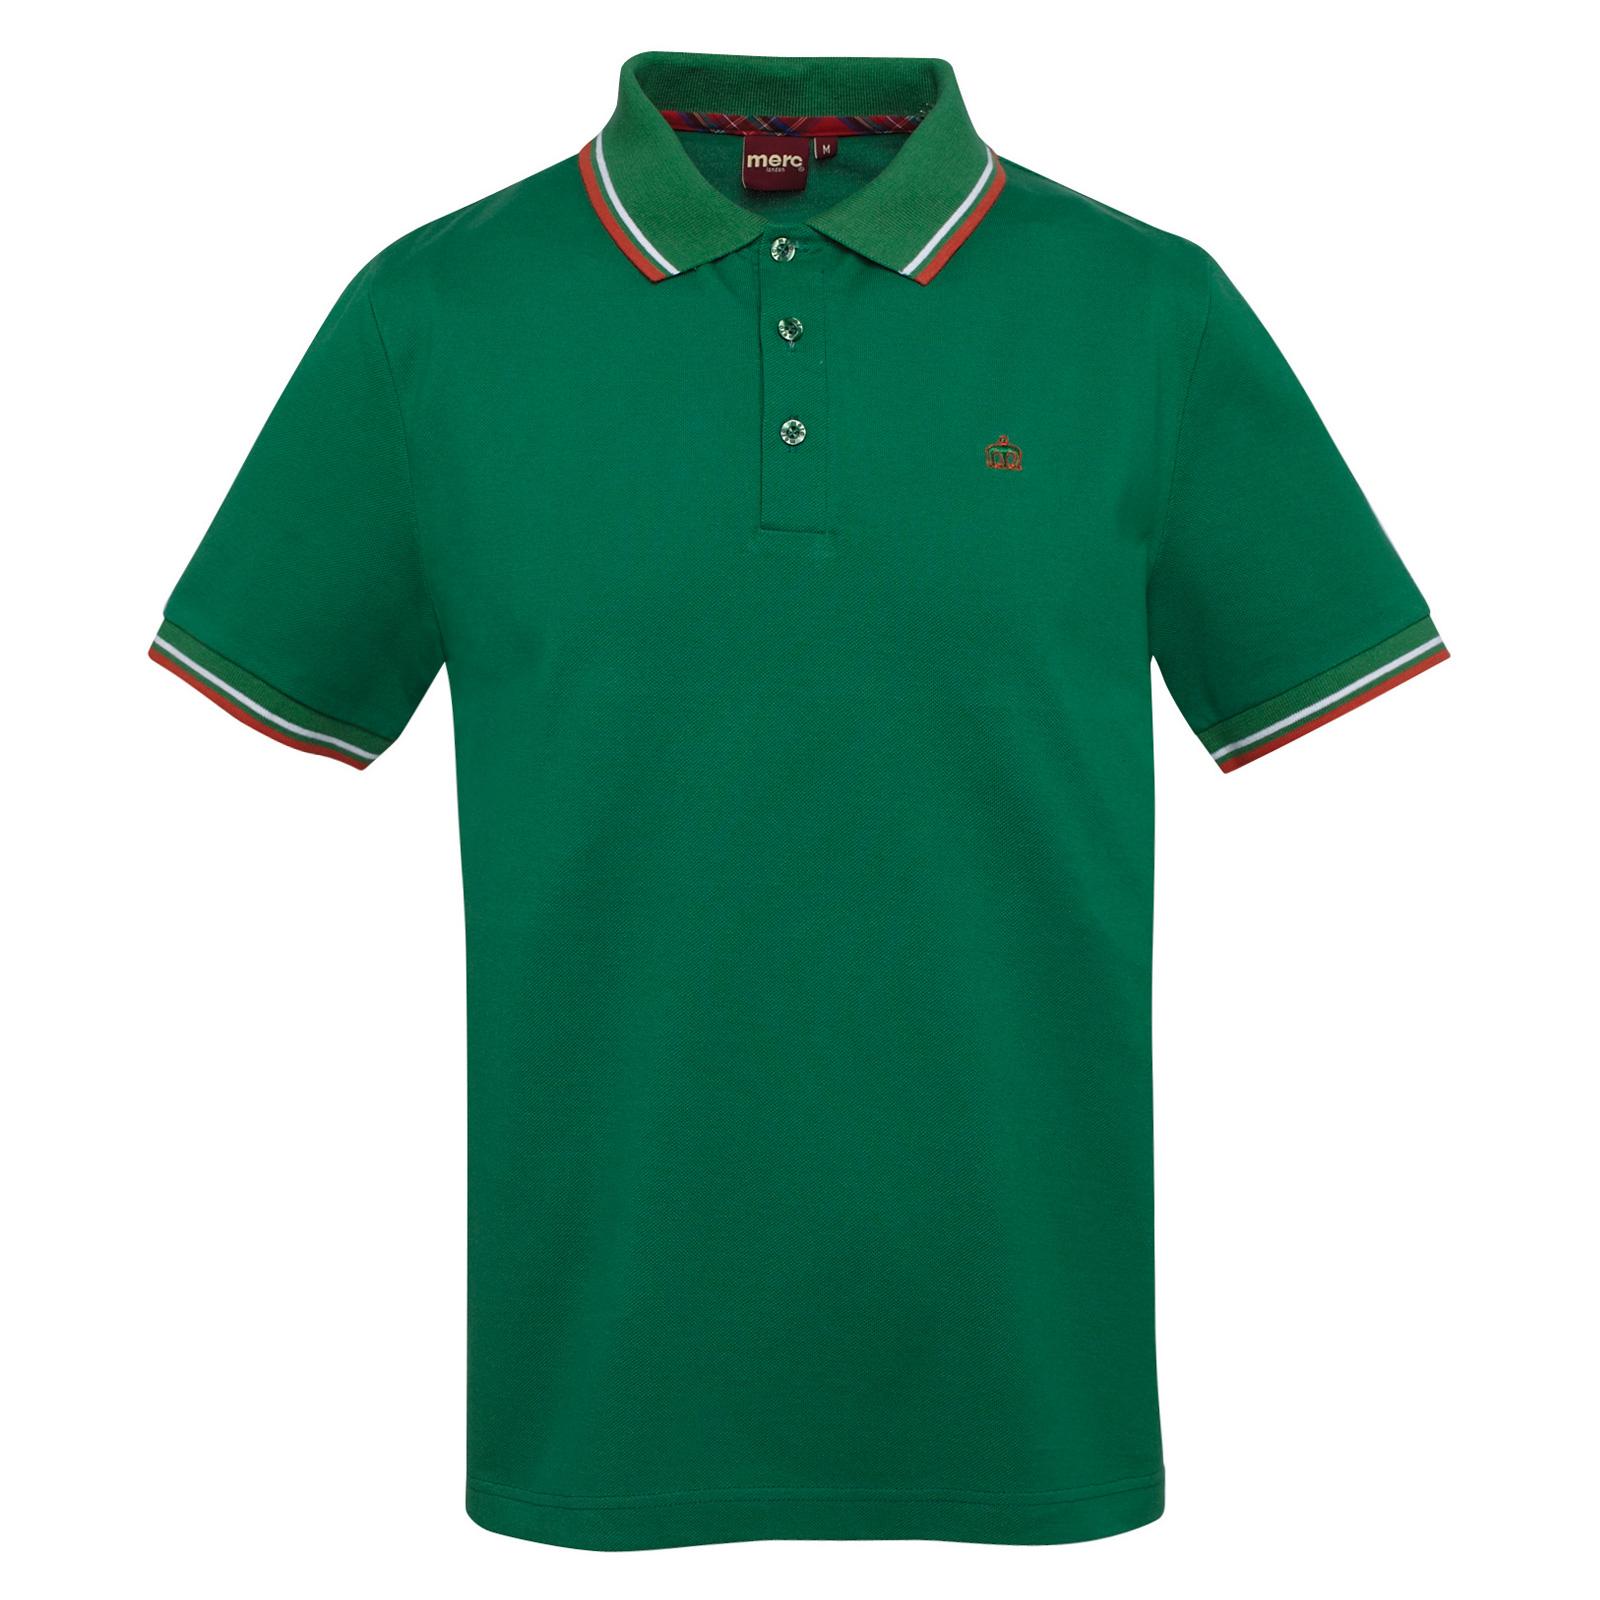 Koszulka MERC LONDON POLO CARD SHIRT Zielona